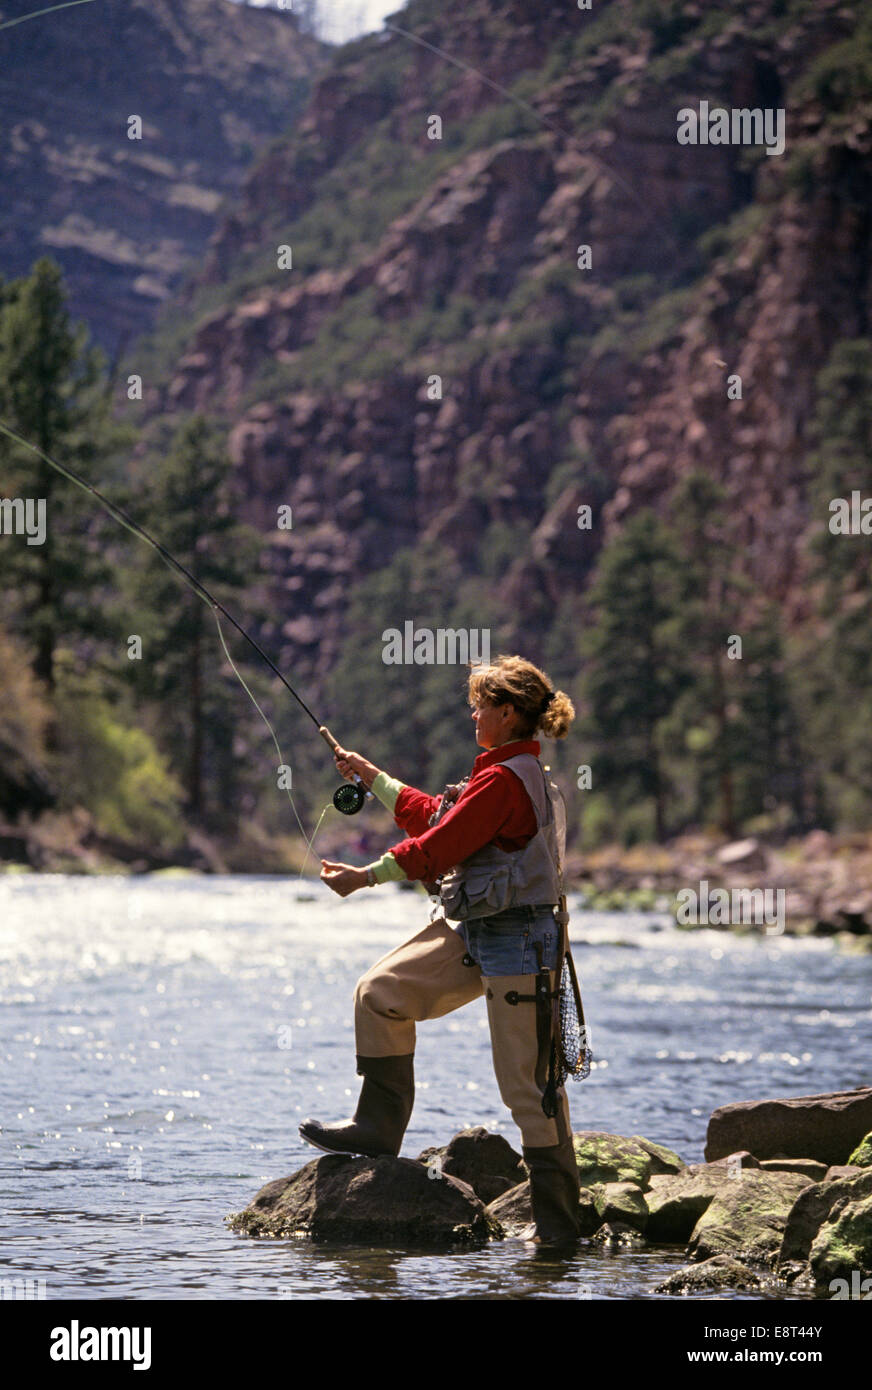 Fly fish usa for Fly fishing green river utah